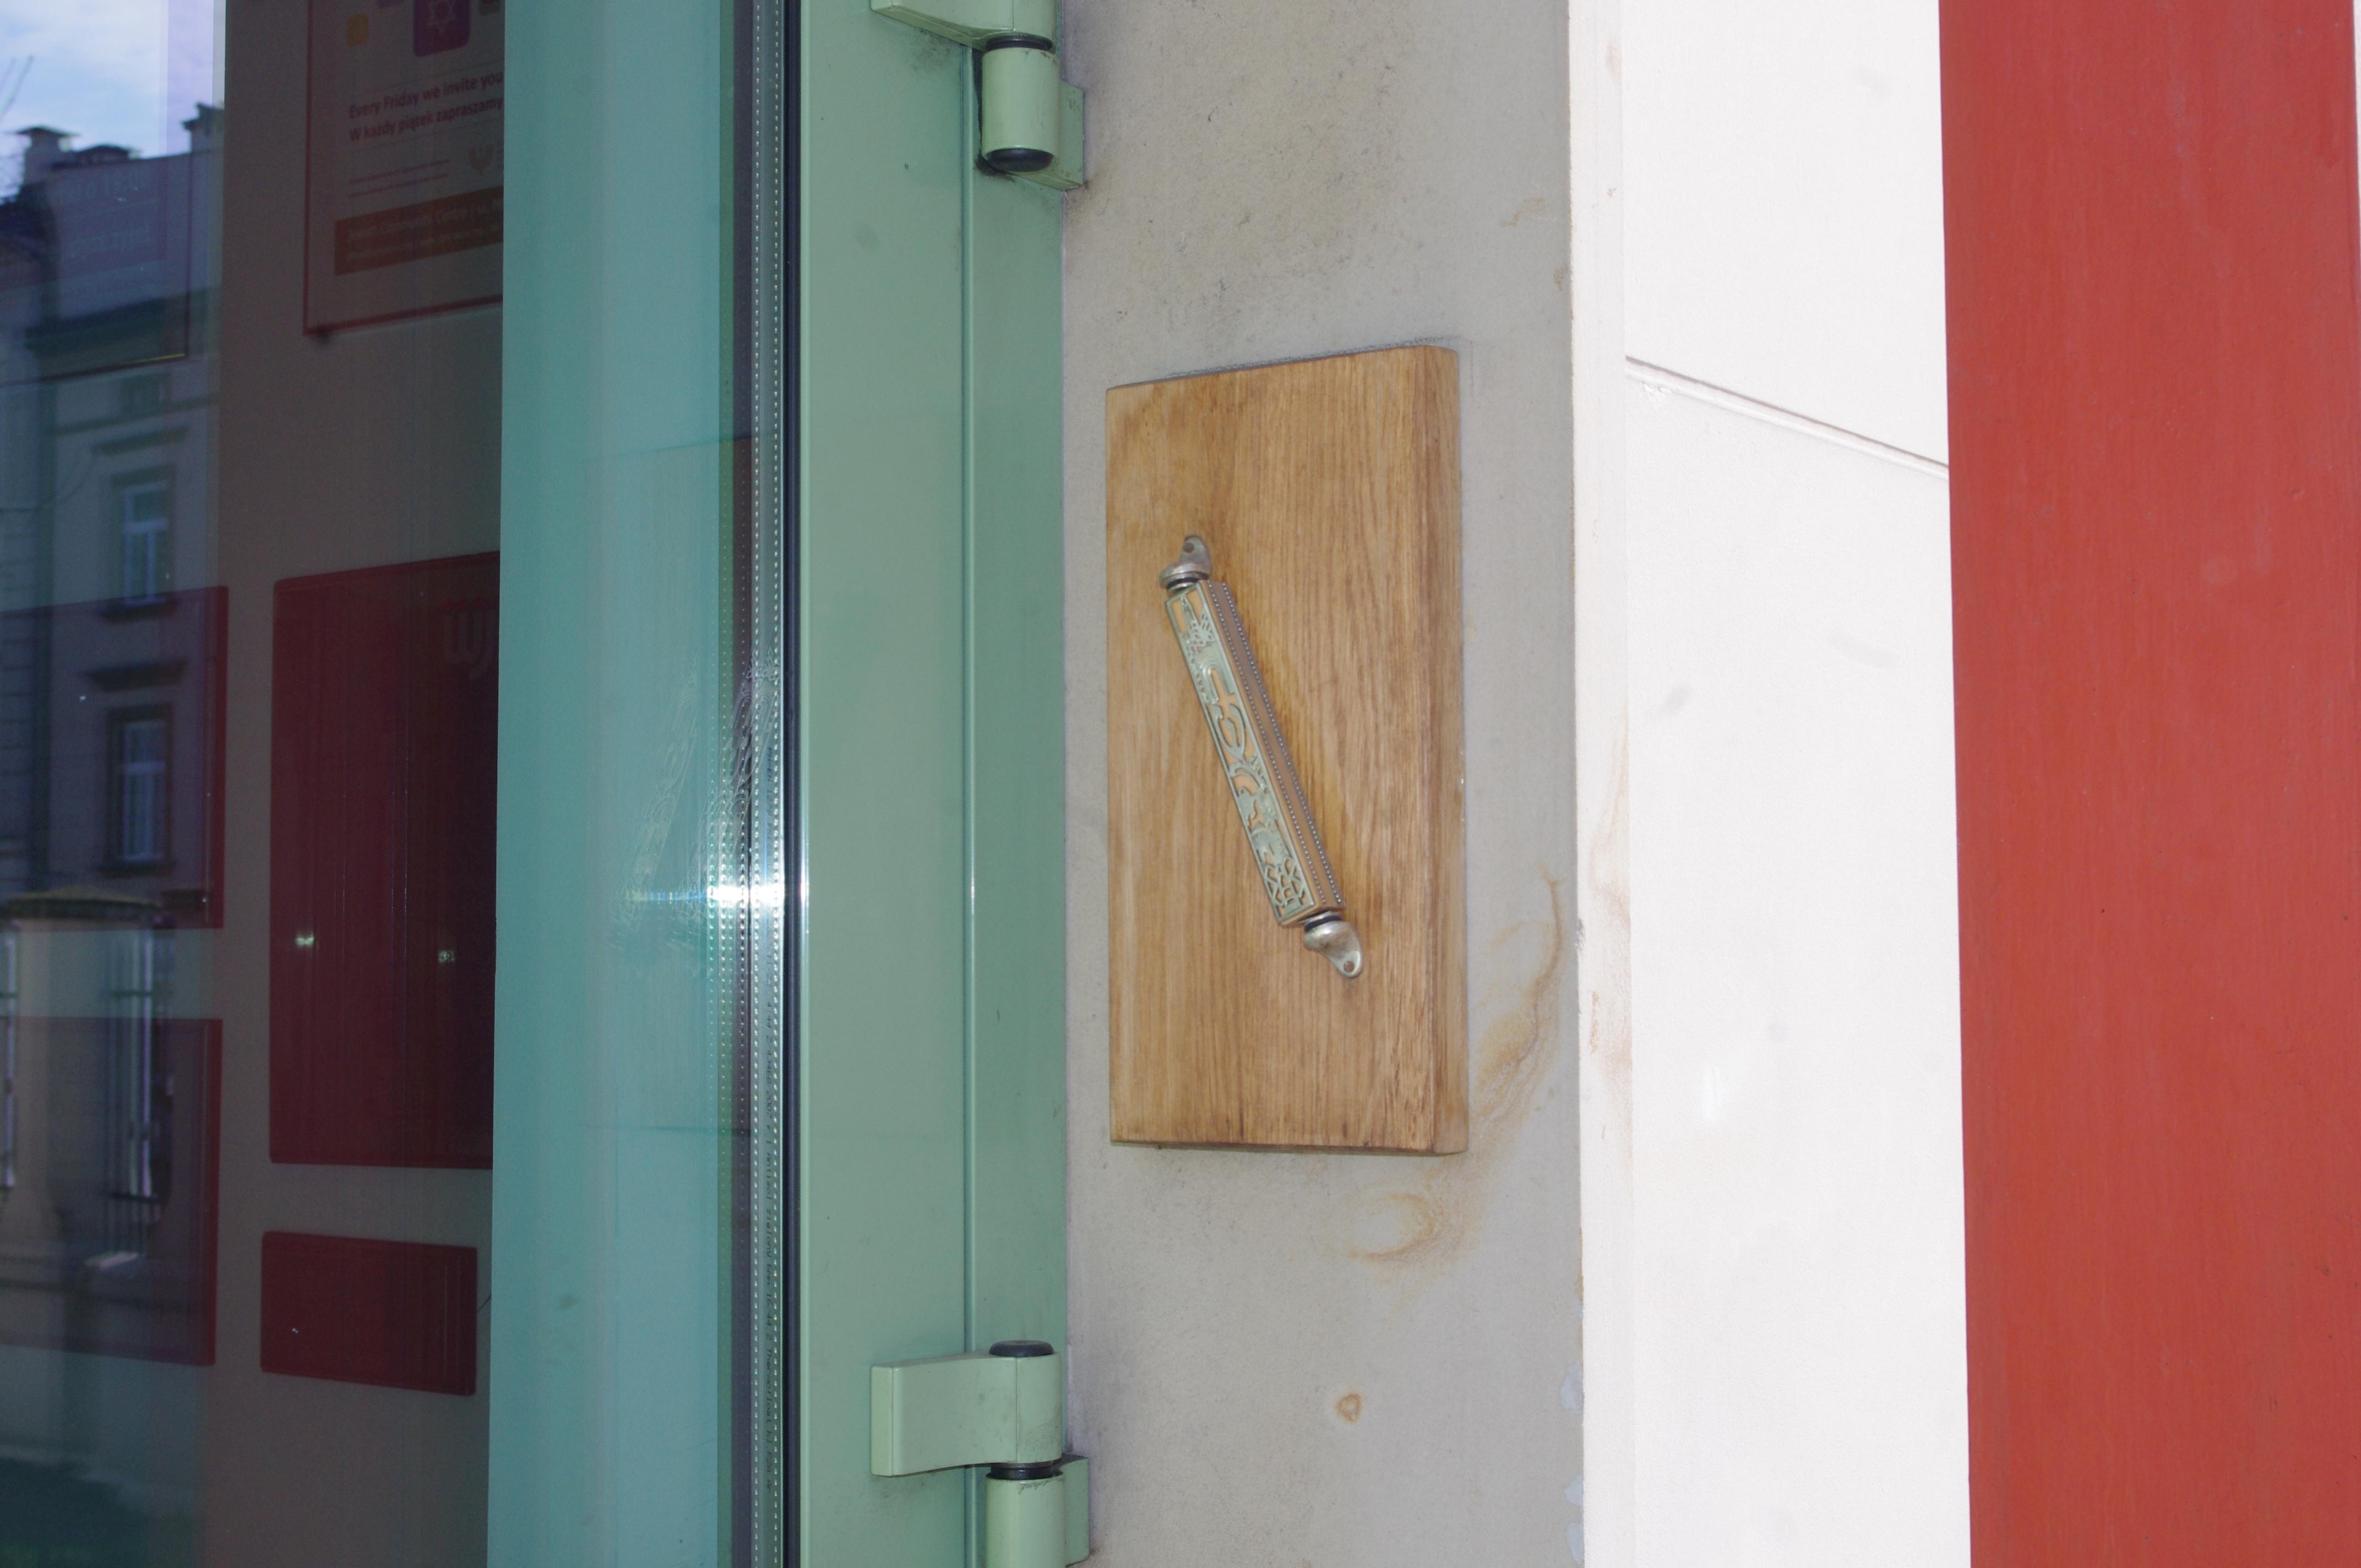 FileThe mezuzah at Jewish Community Center in Kraków.jpg & File:The mezuzah at Jewish Community Center in Kraków.jpg ...